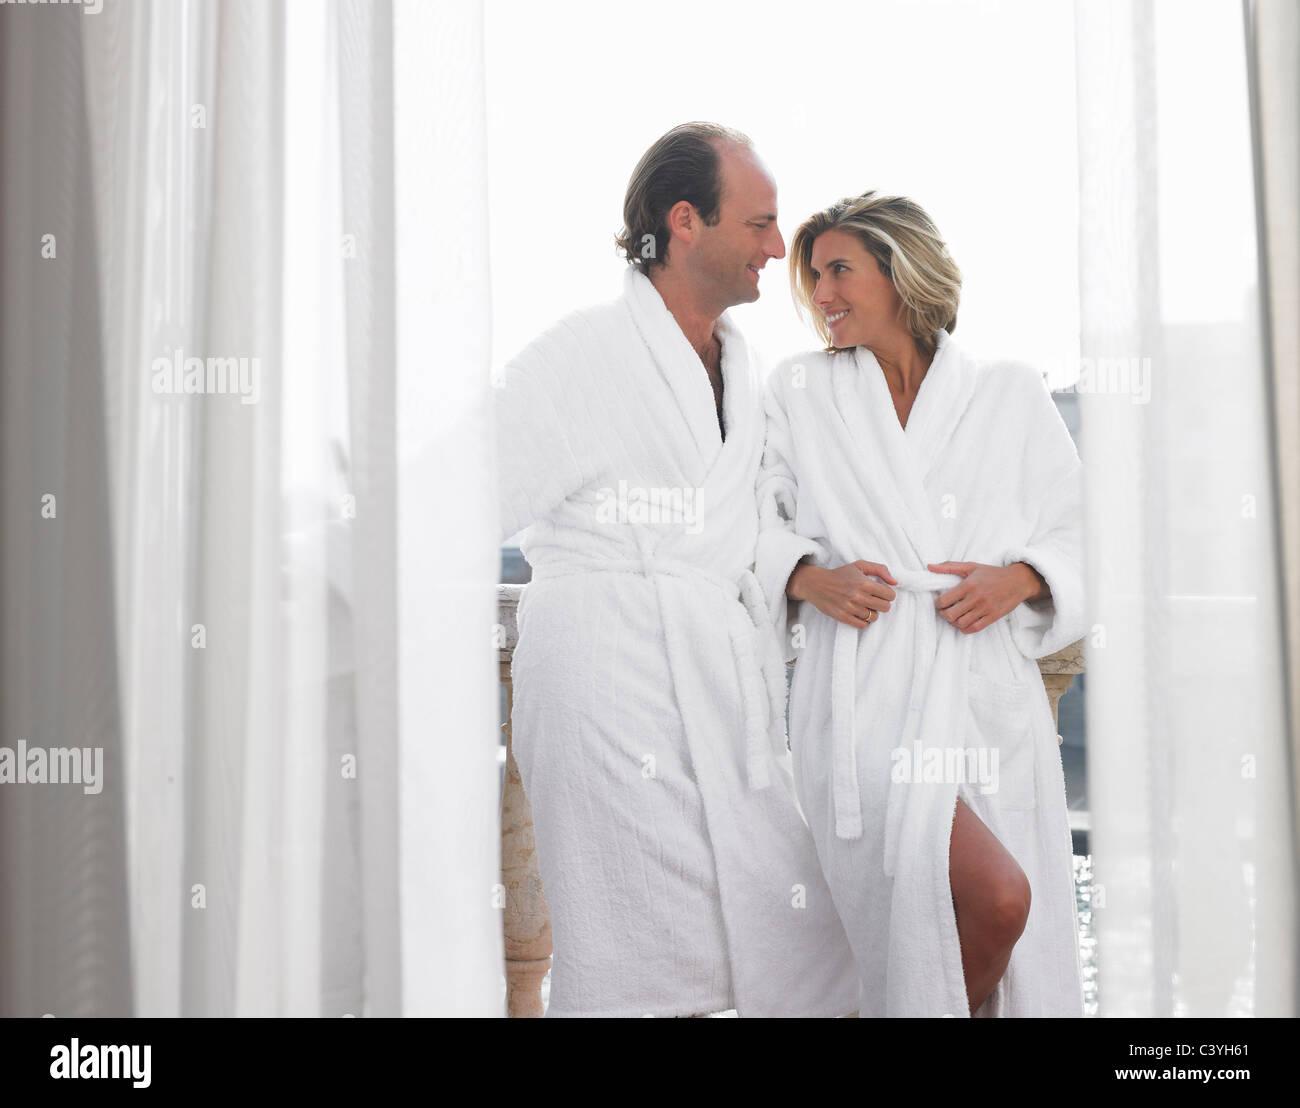 robe stockfotos robe bilder alamy With katzennetz balkon mit two hands lily s garden shiraz